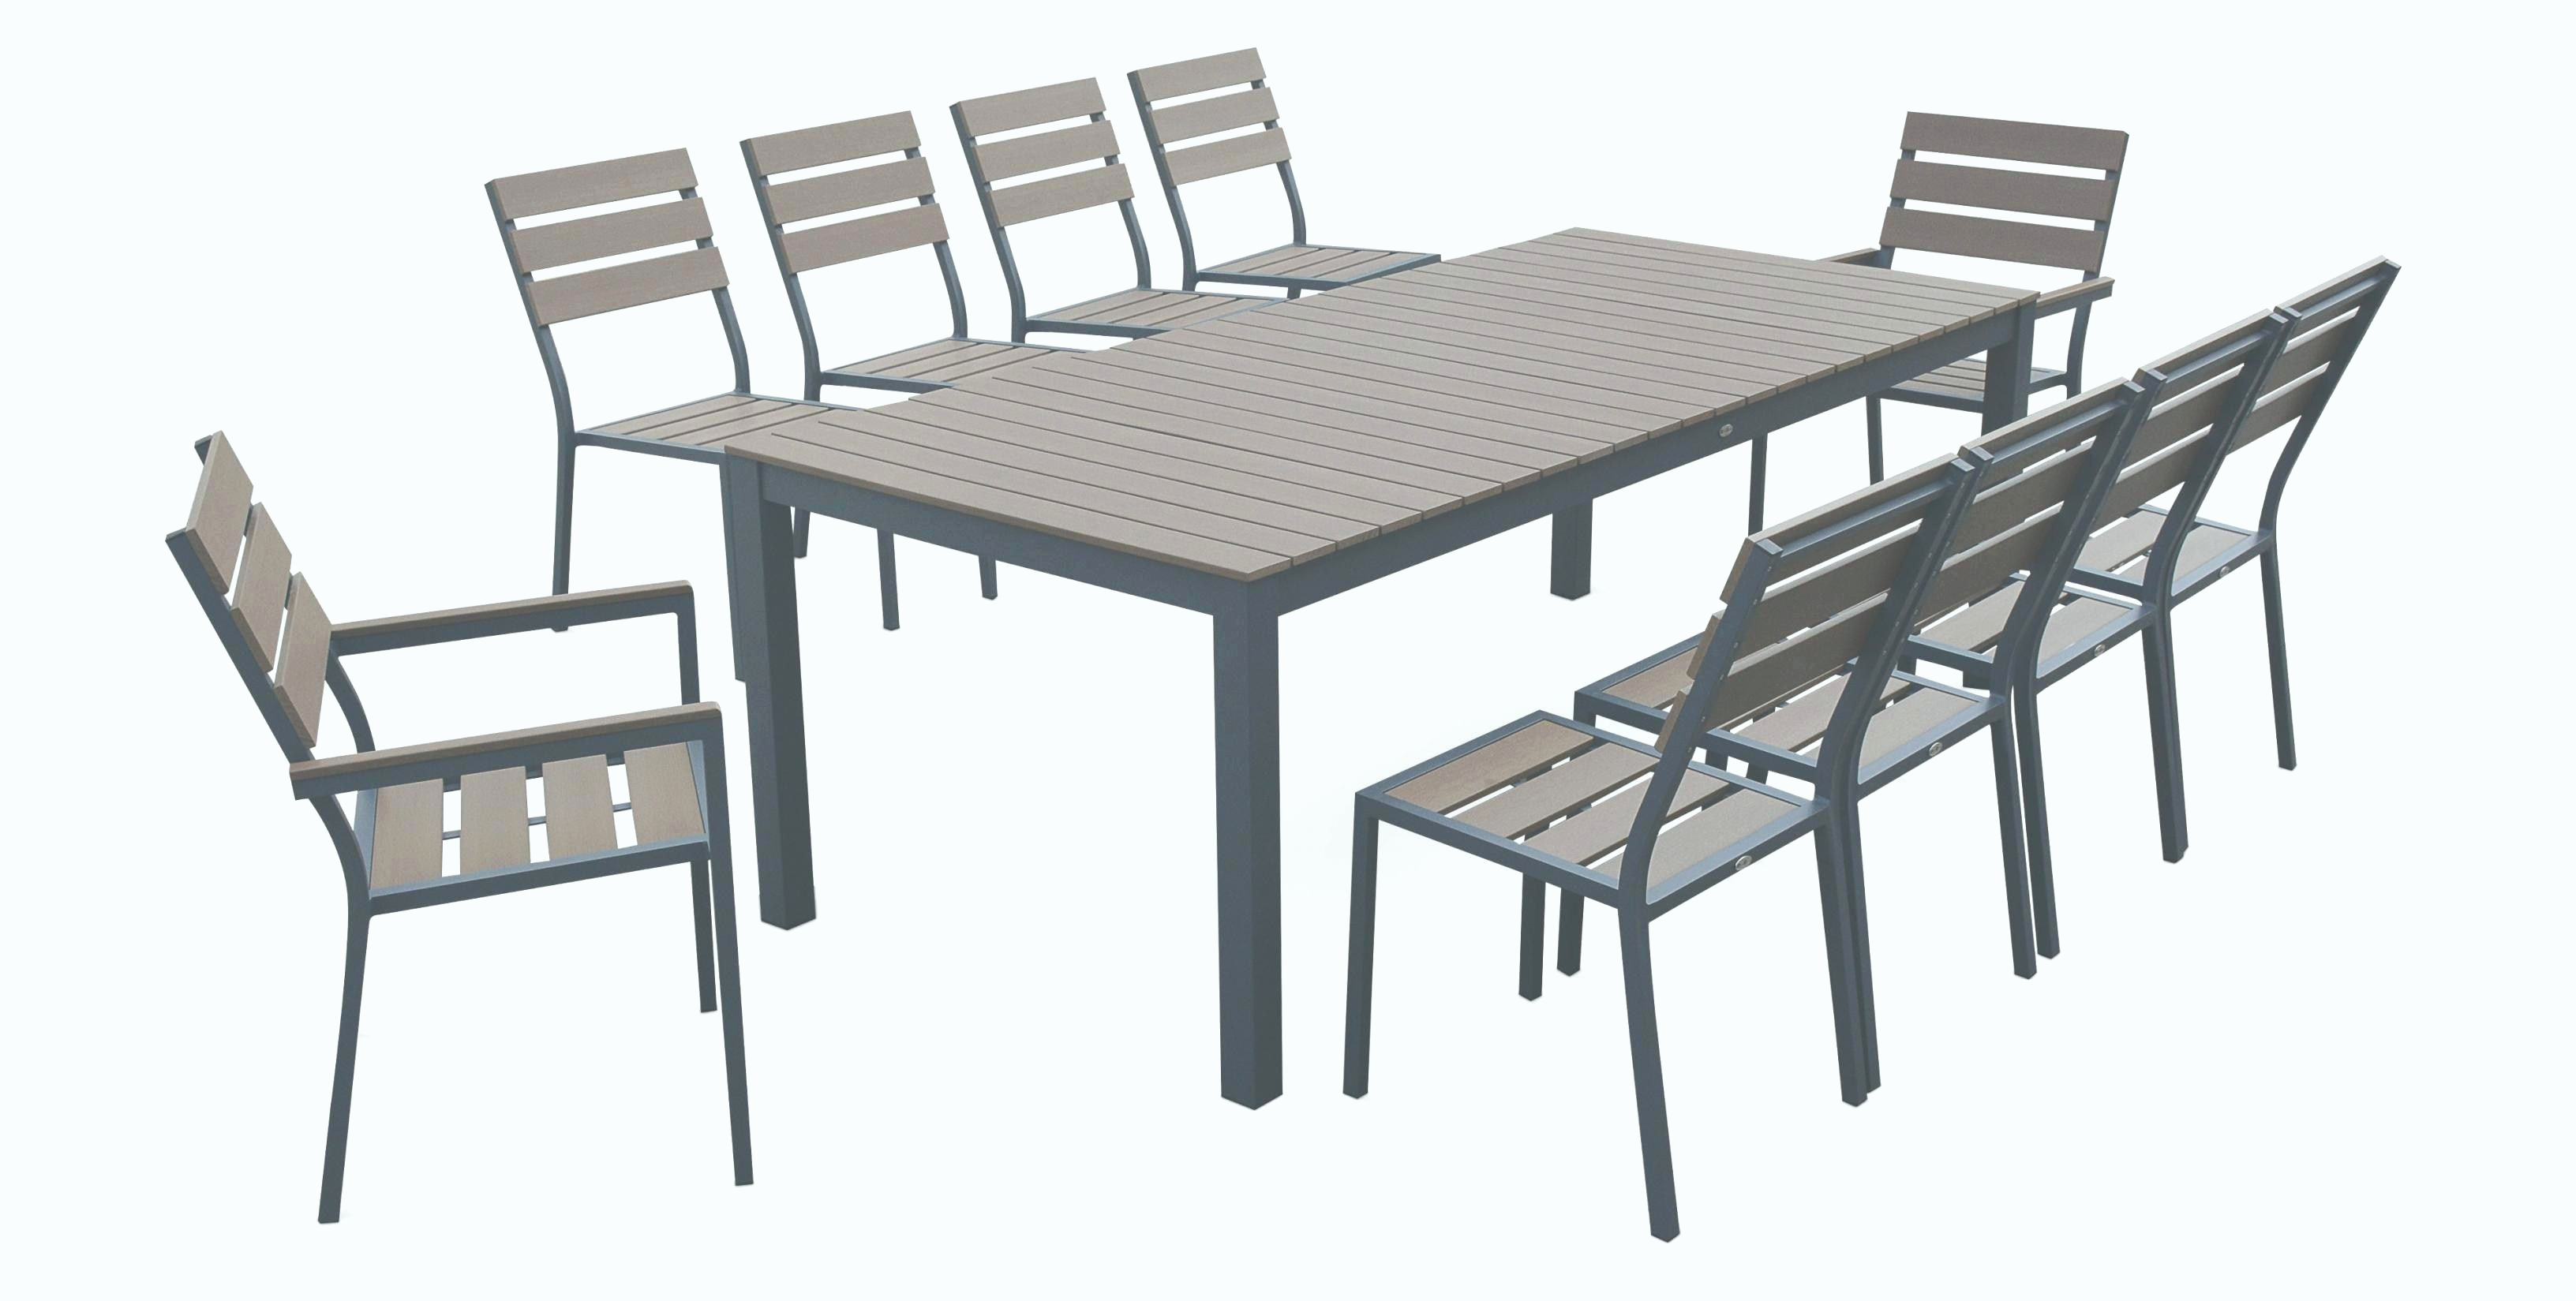 Table Salon Conforama Beau Photos Salon De Jardin Confortable Luxe Chaise A Conforama Luxe Chaises